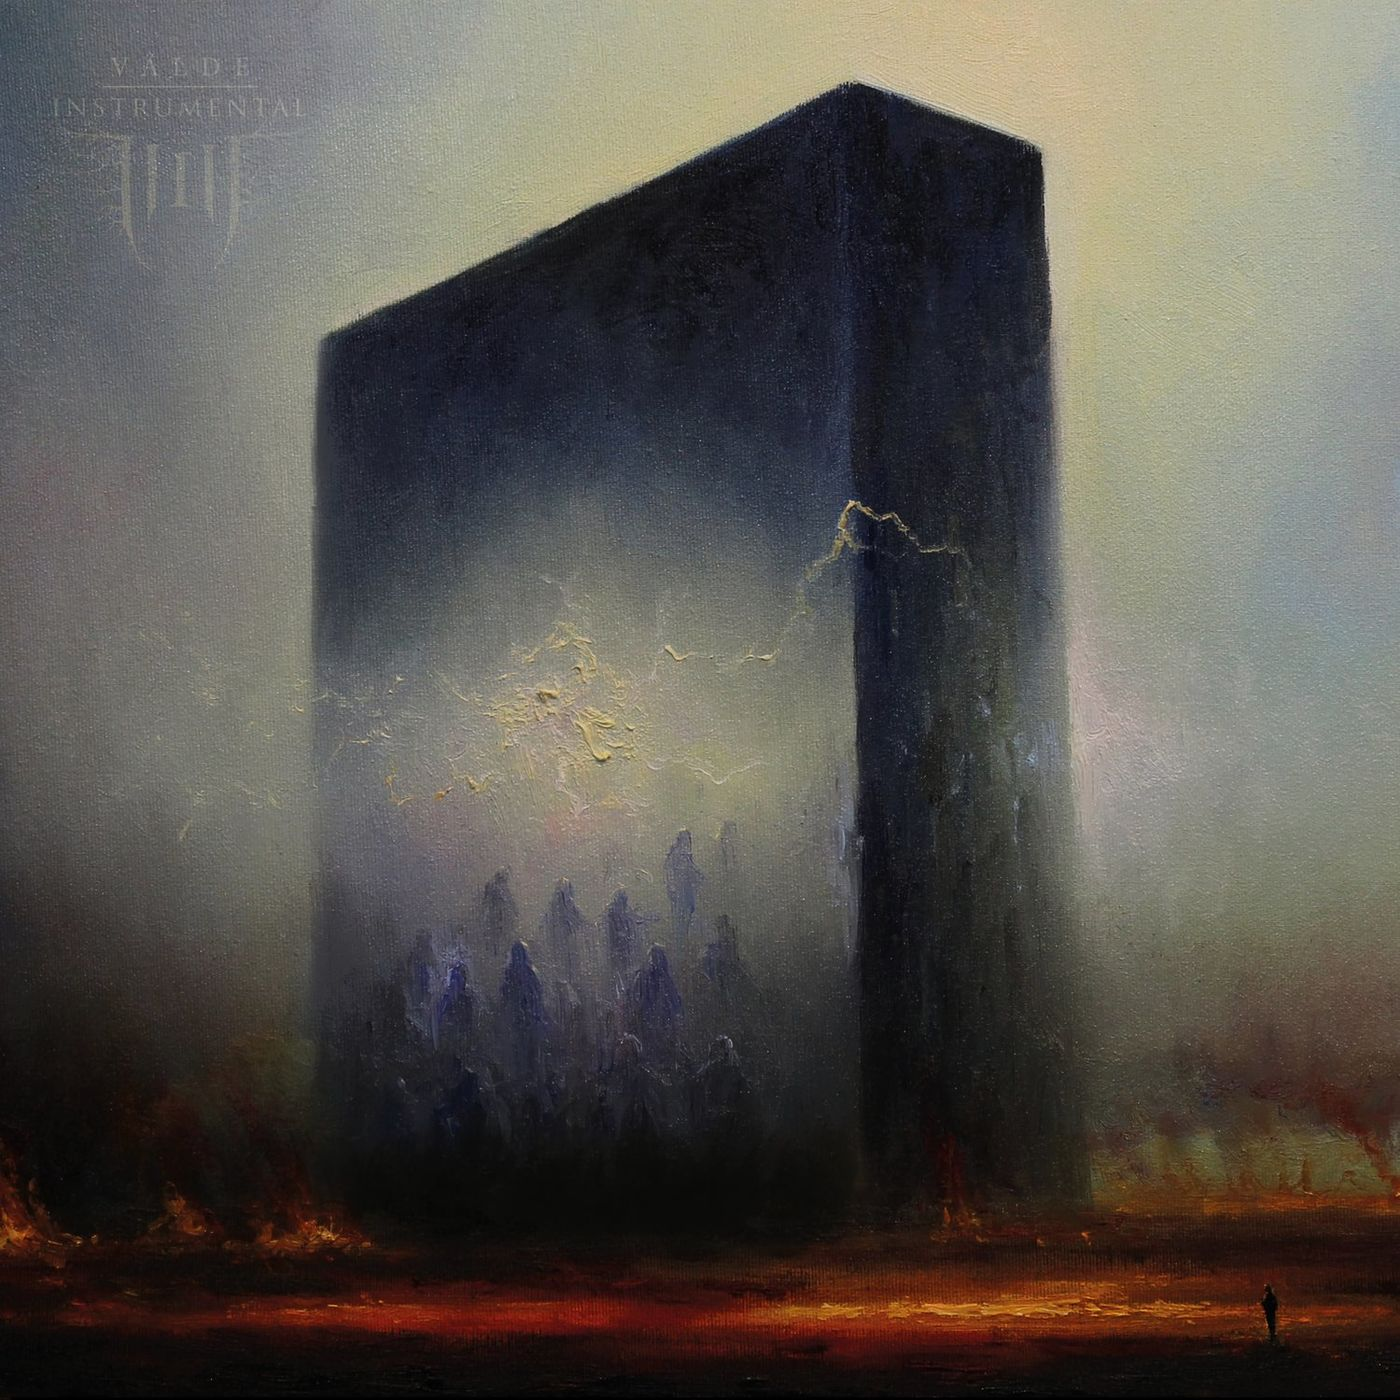 Humanity's Last Breath - Välde (Instrumental) (2021)